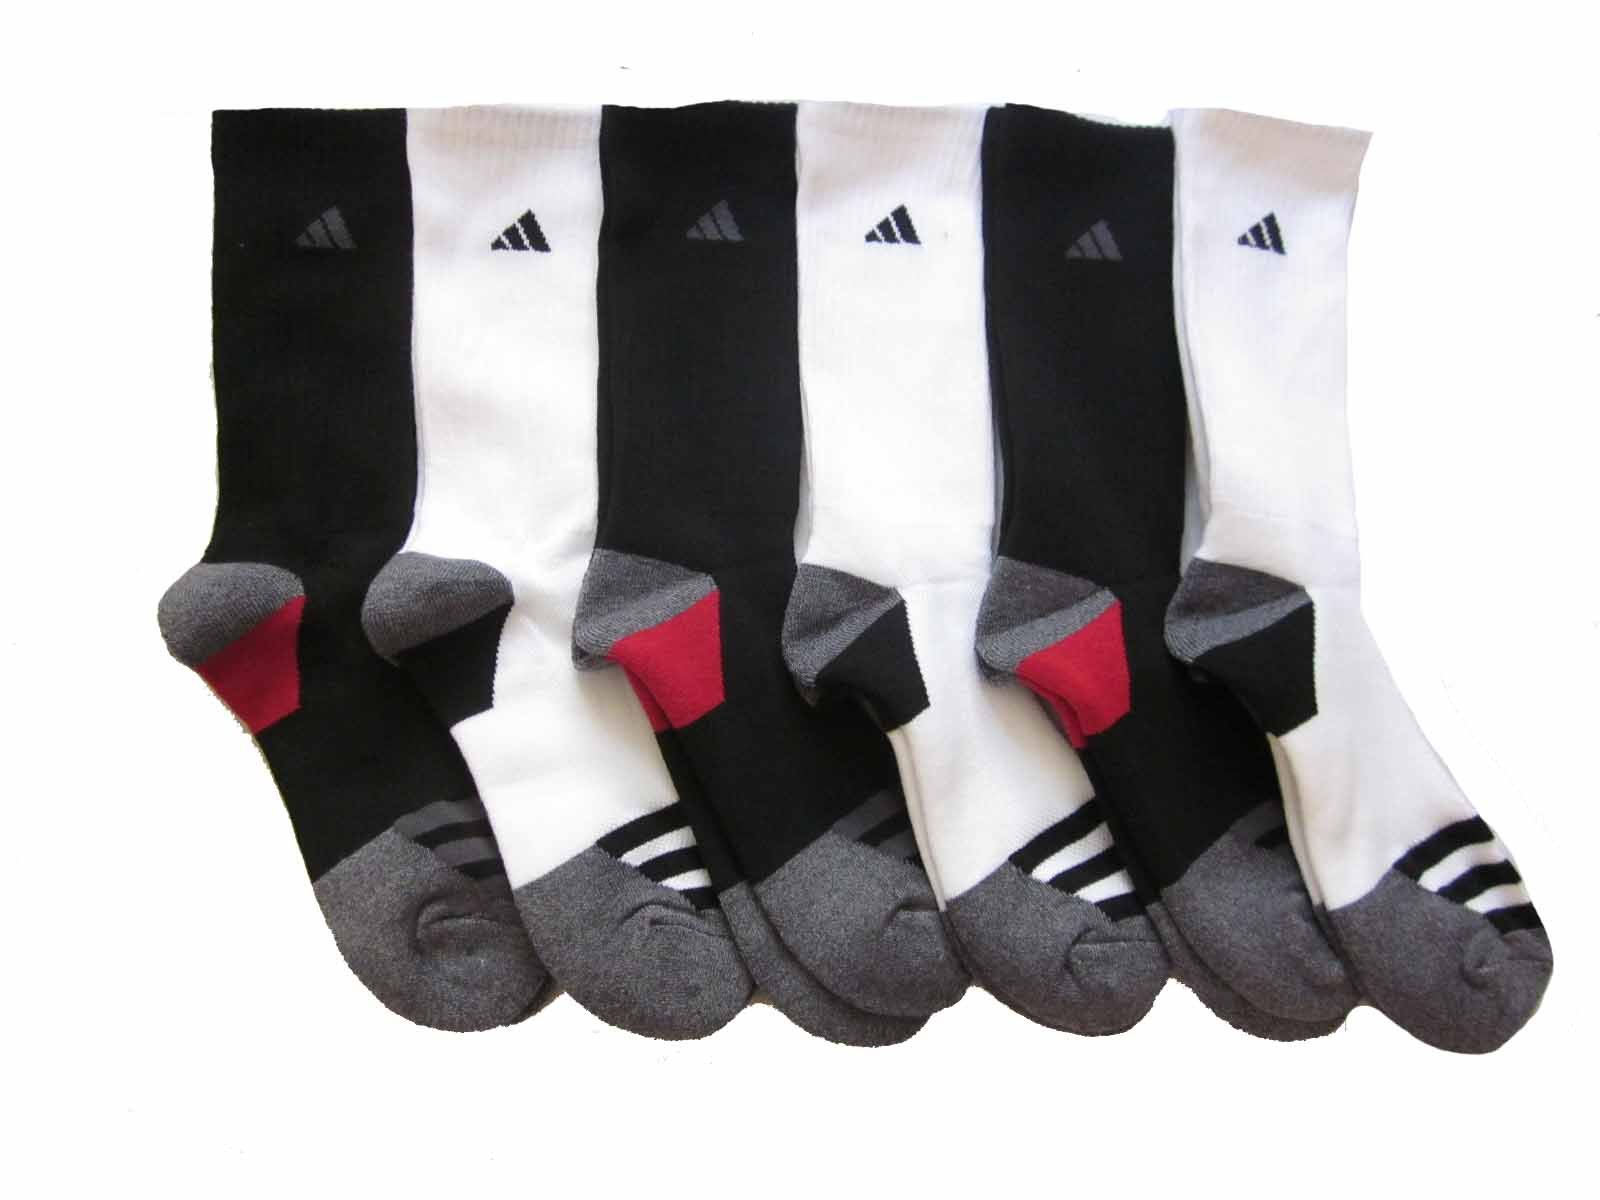 adidas Men's Athletic Crew Socks (6-Pack) (Black/White (Gray/Black Logos)) by adidas